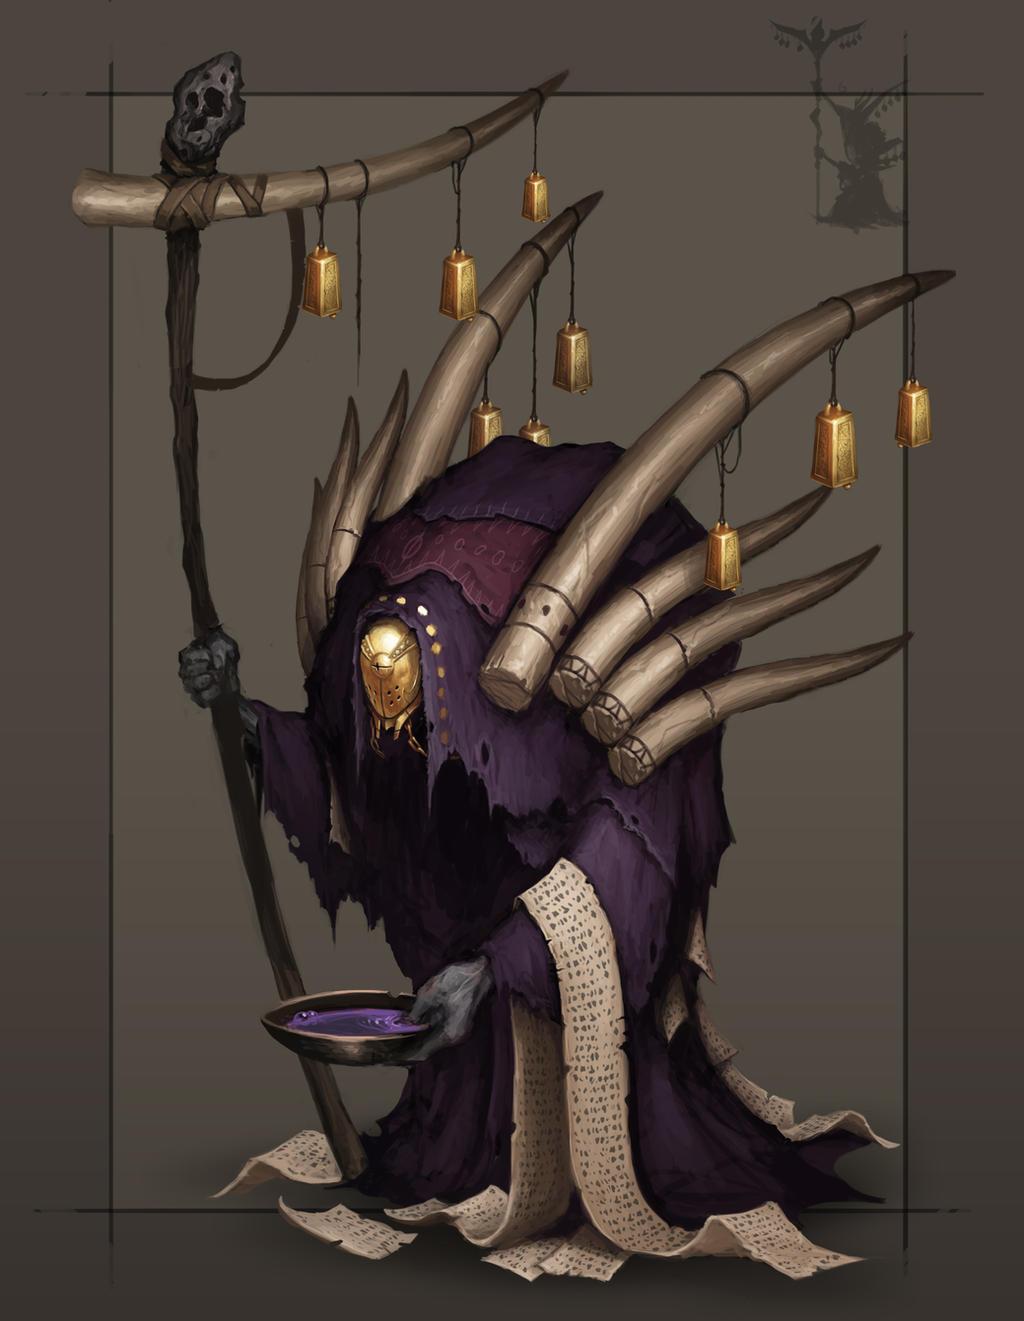 High Priest - Ancient Civilization challenge by MorkarDFC